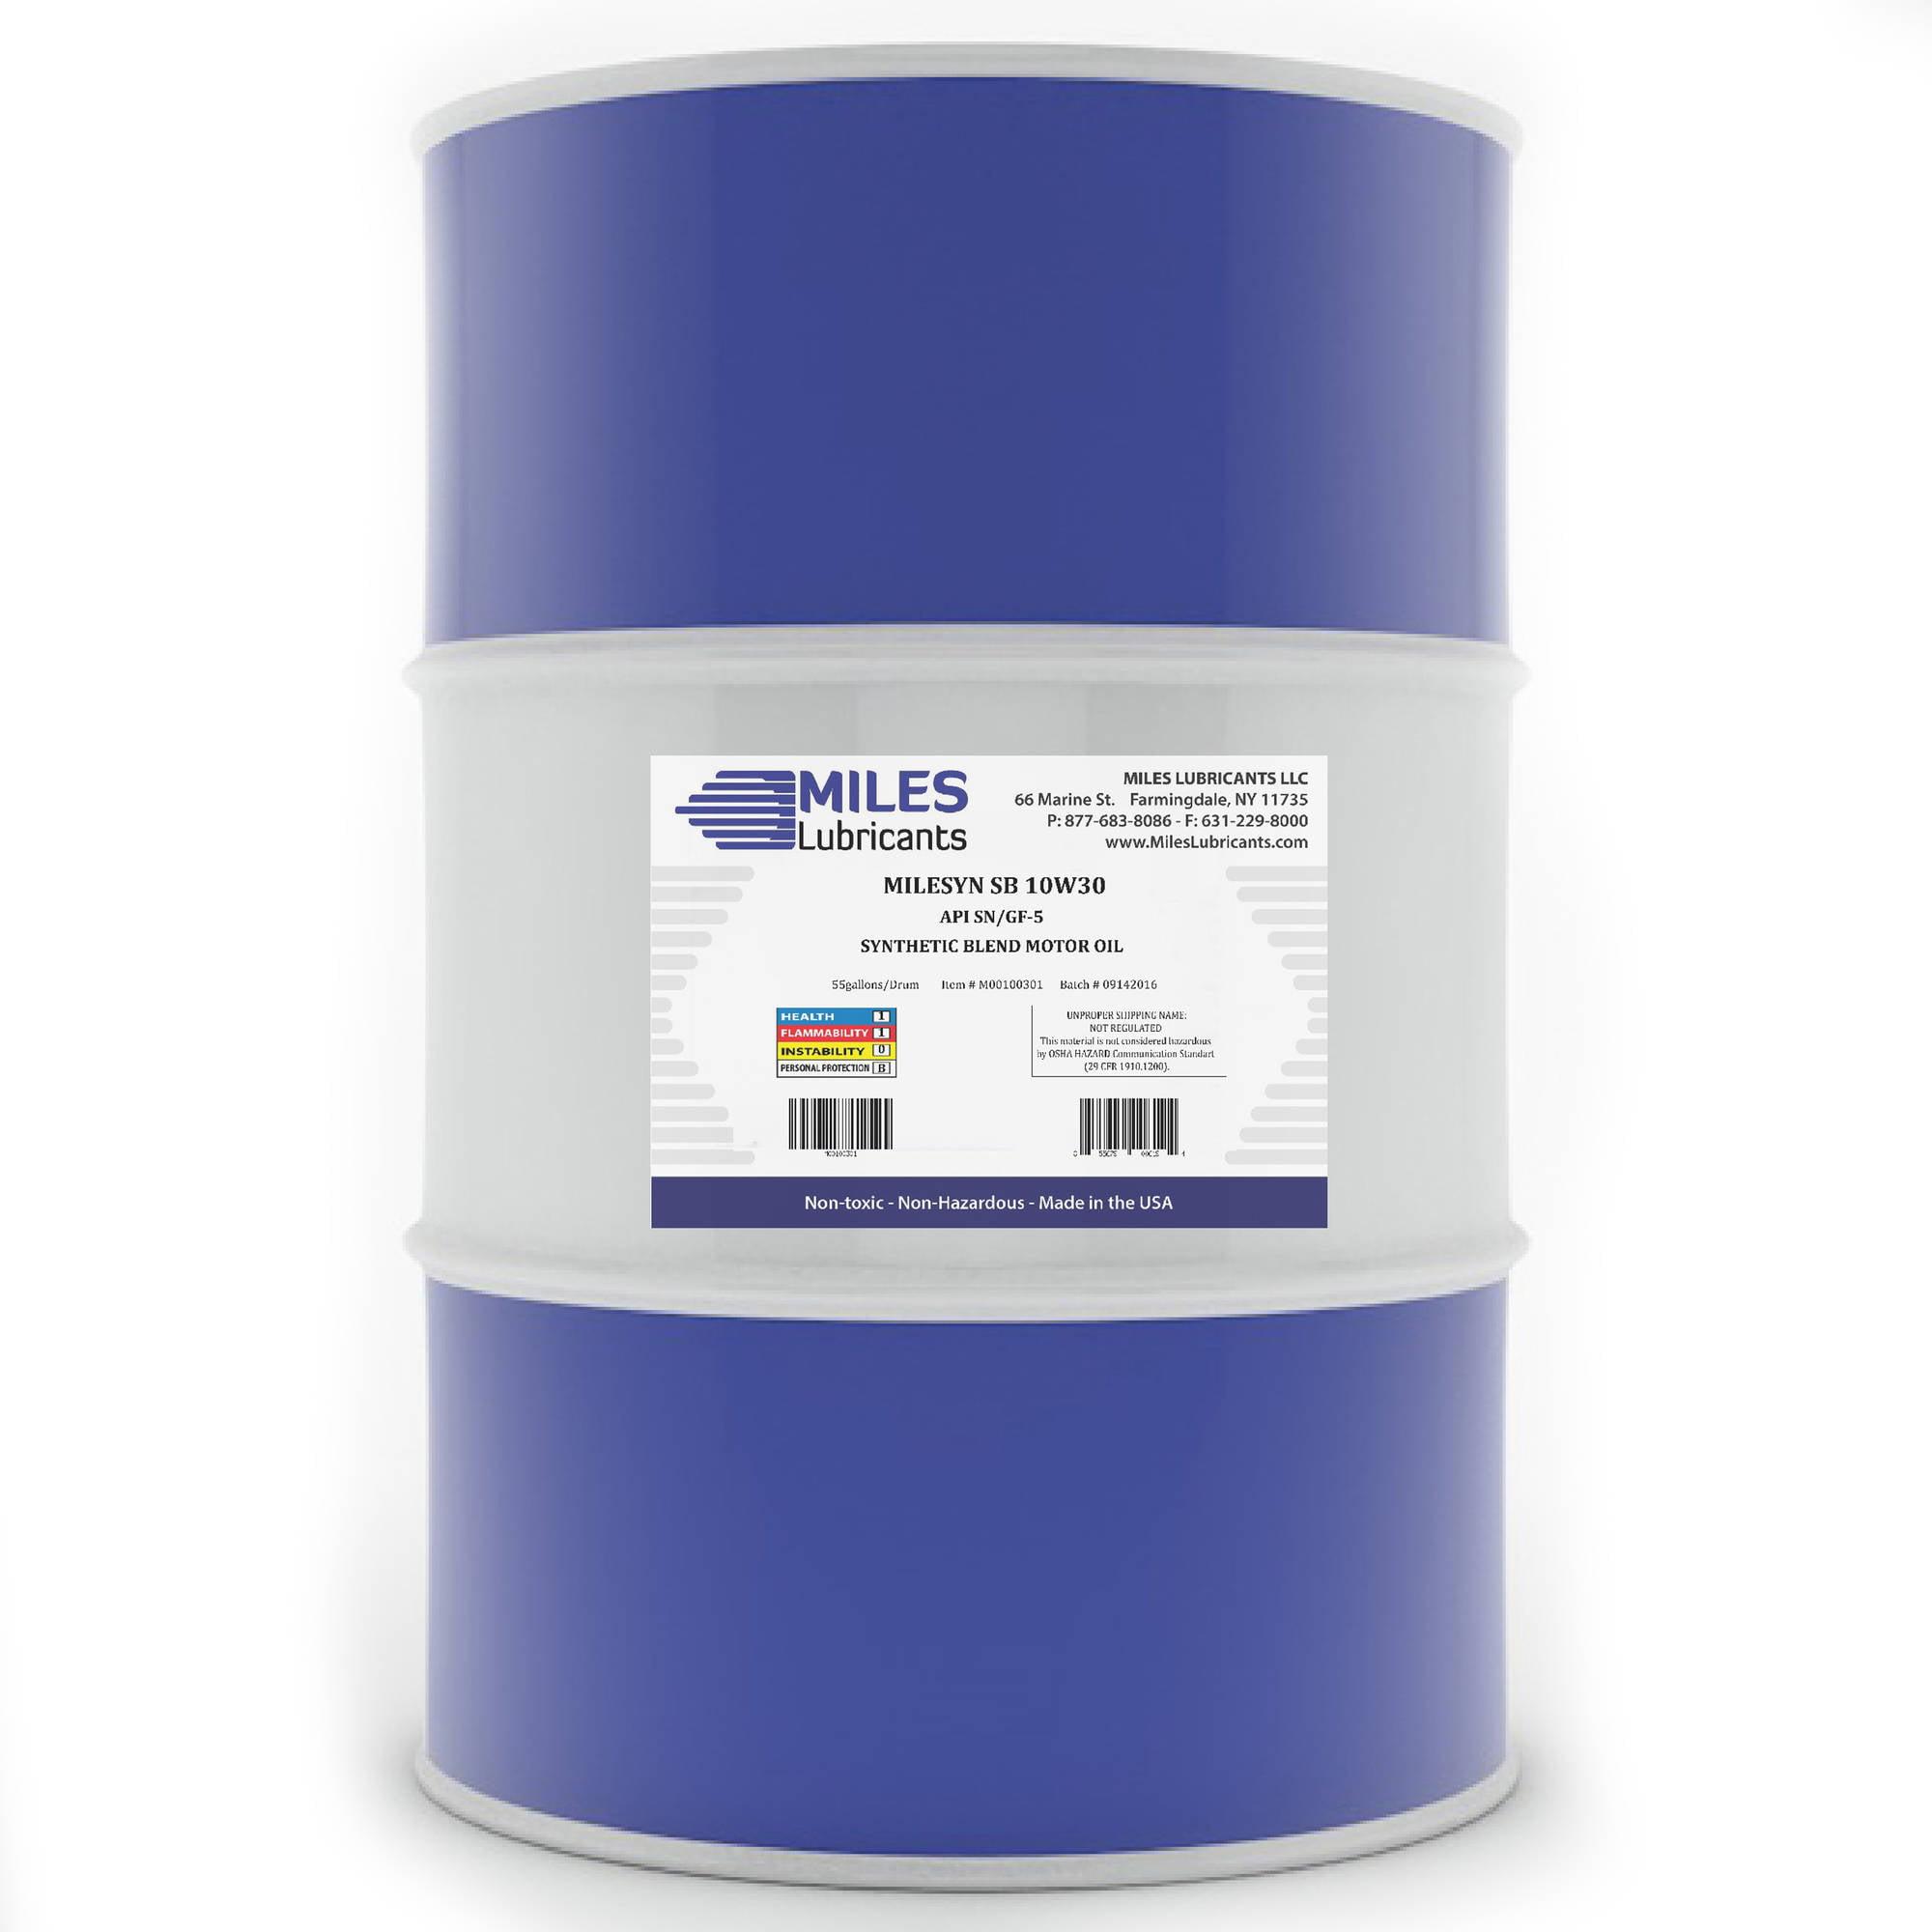 Milesyn SB 10W30 API GF-5/SN, Synthetic Blend Motor Oil 55-Gallon Drum